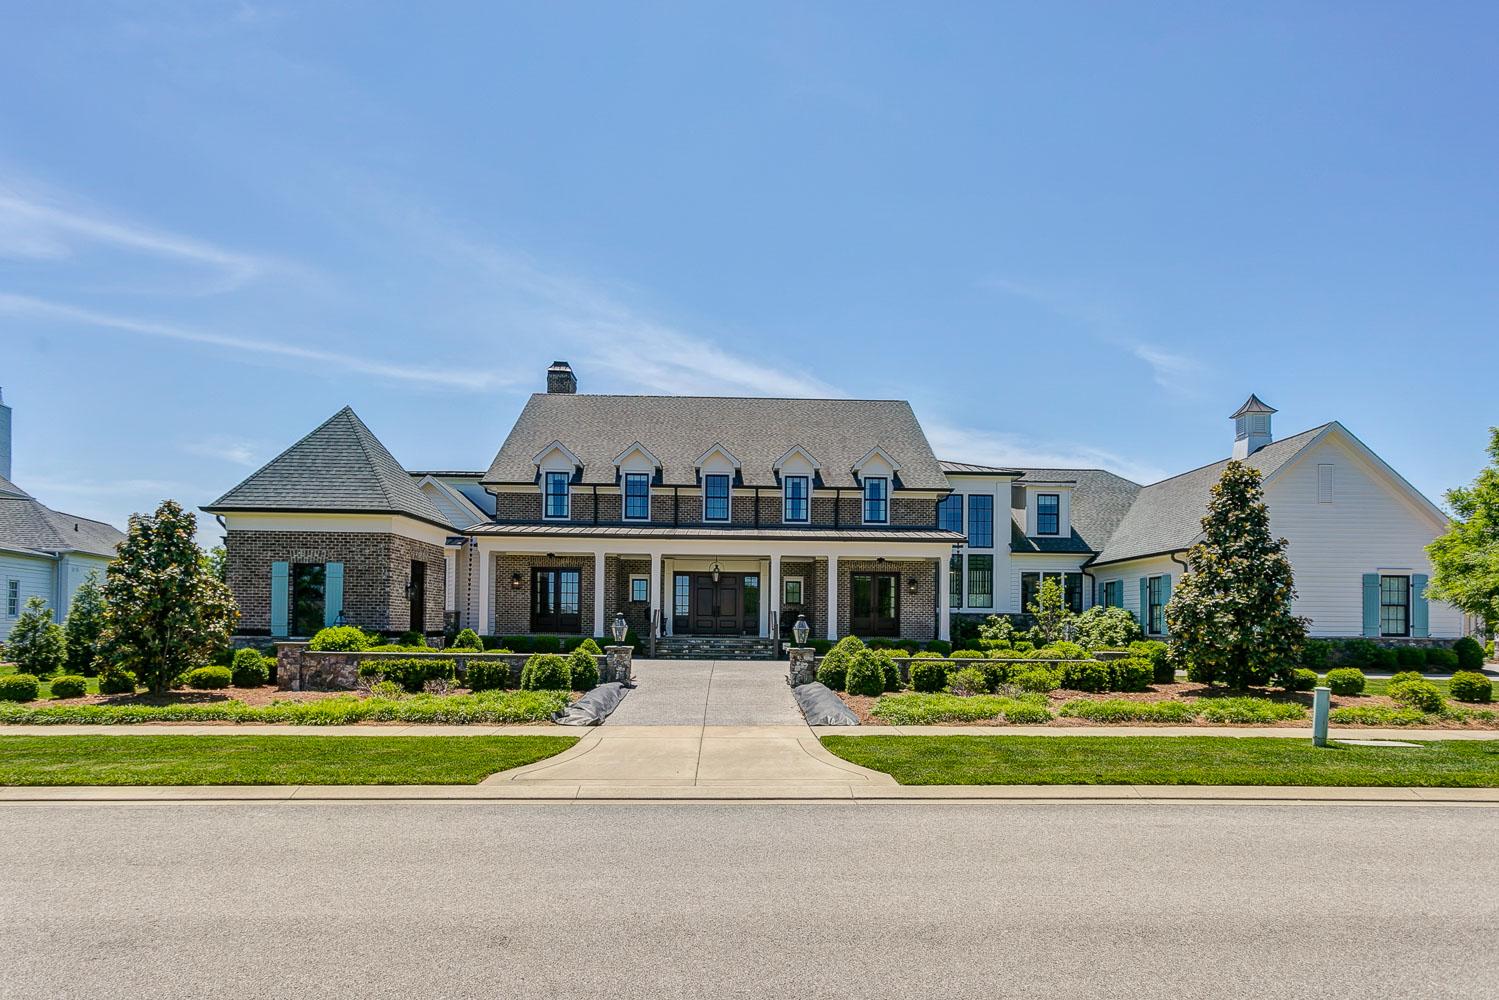 luxury nashville homes for sale